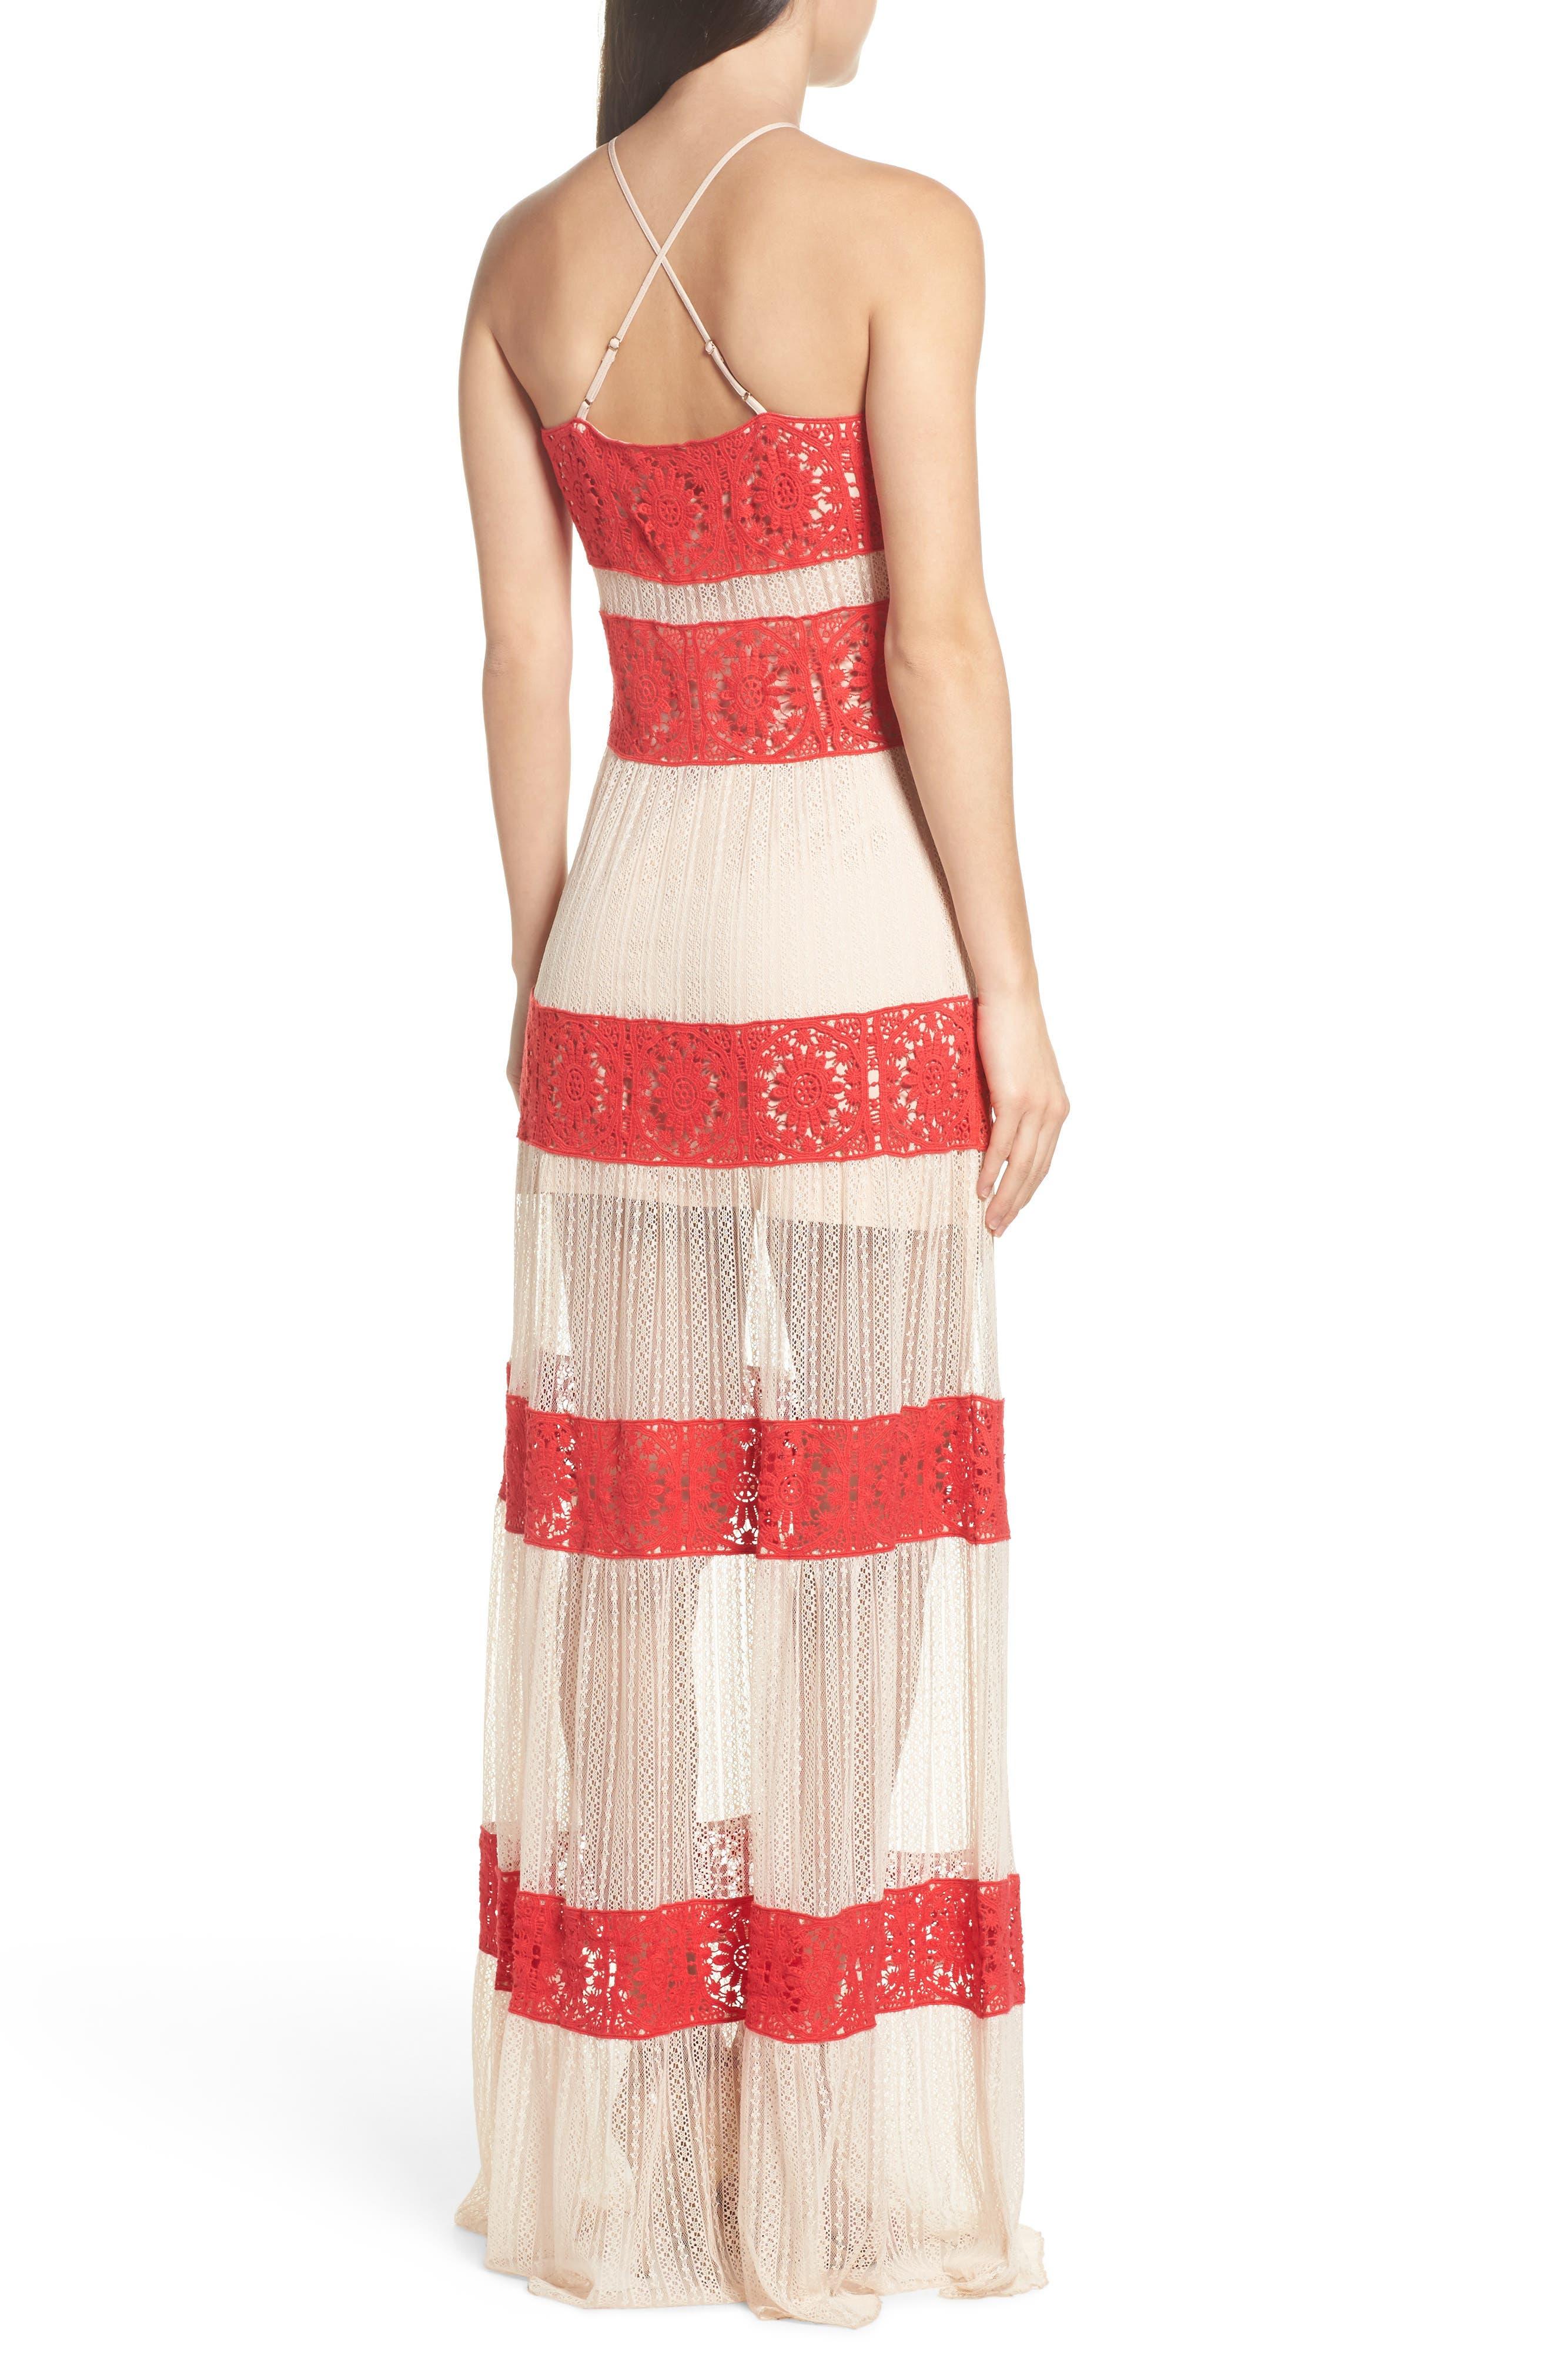 Ophelia Two-Tone Lace Maxi Dress,                             Alternate thumbnail 2, color,                             250